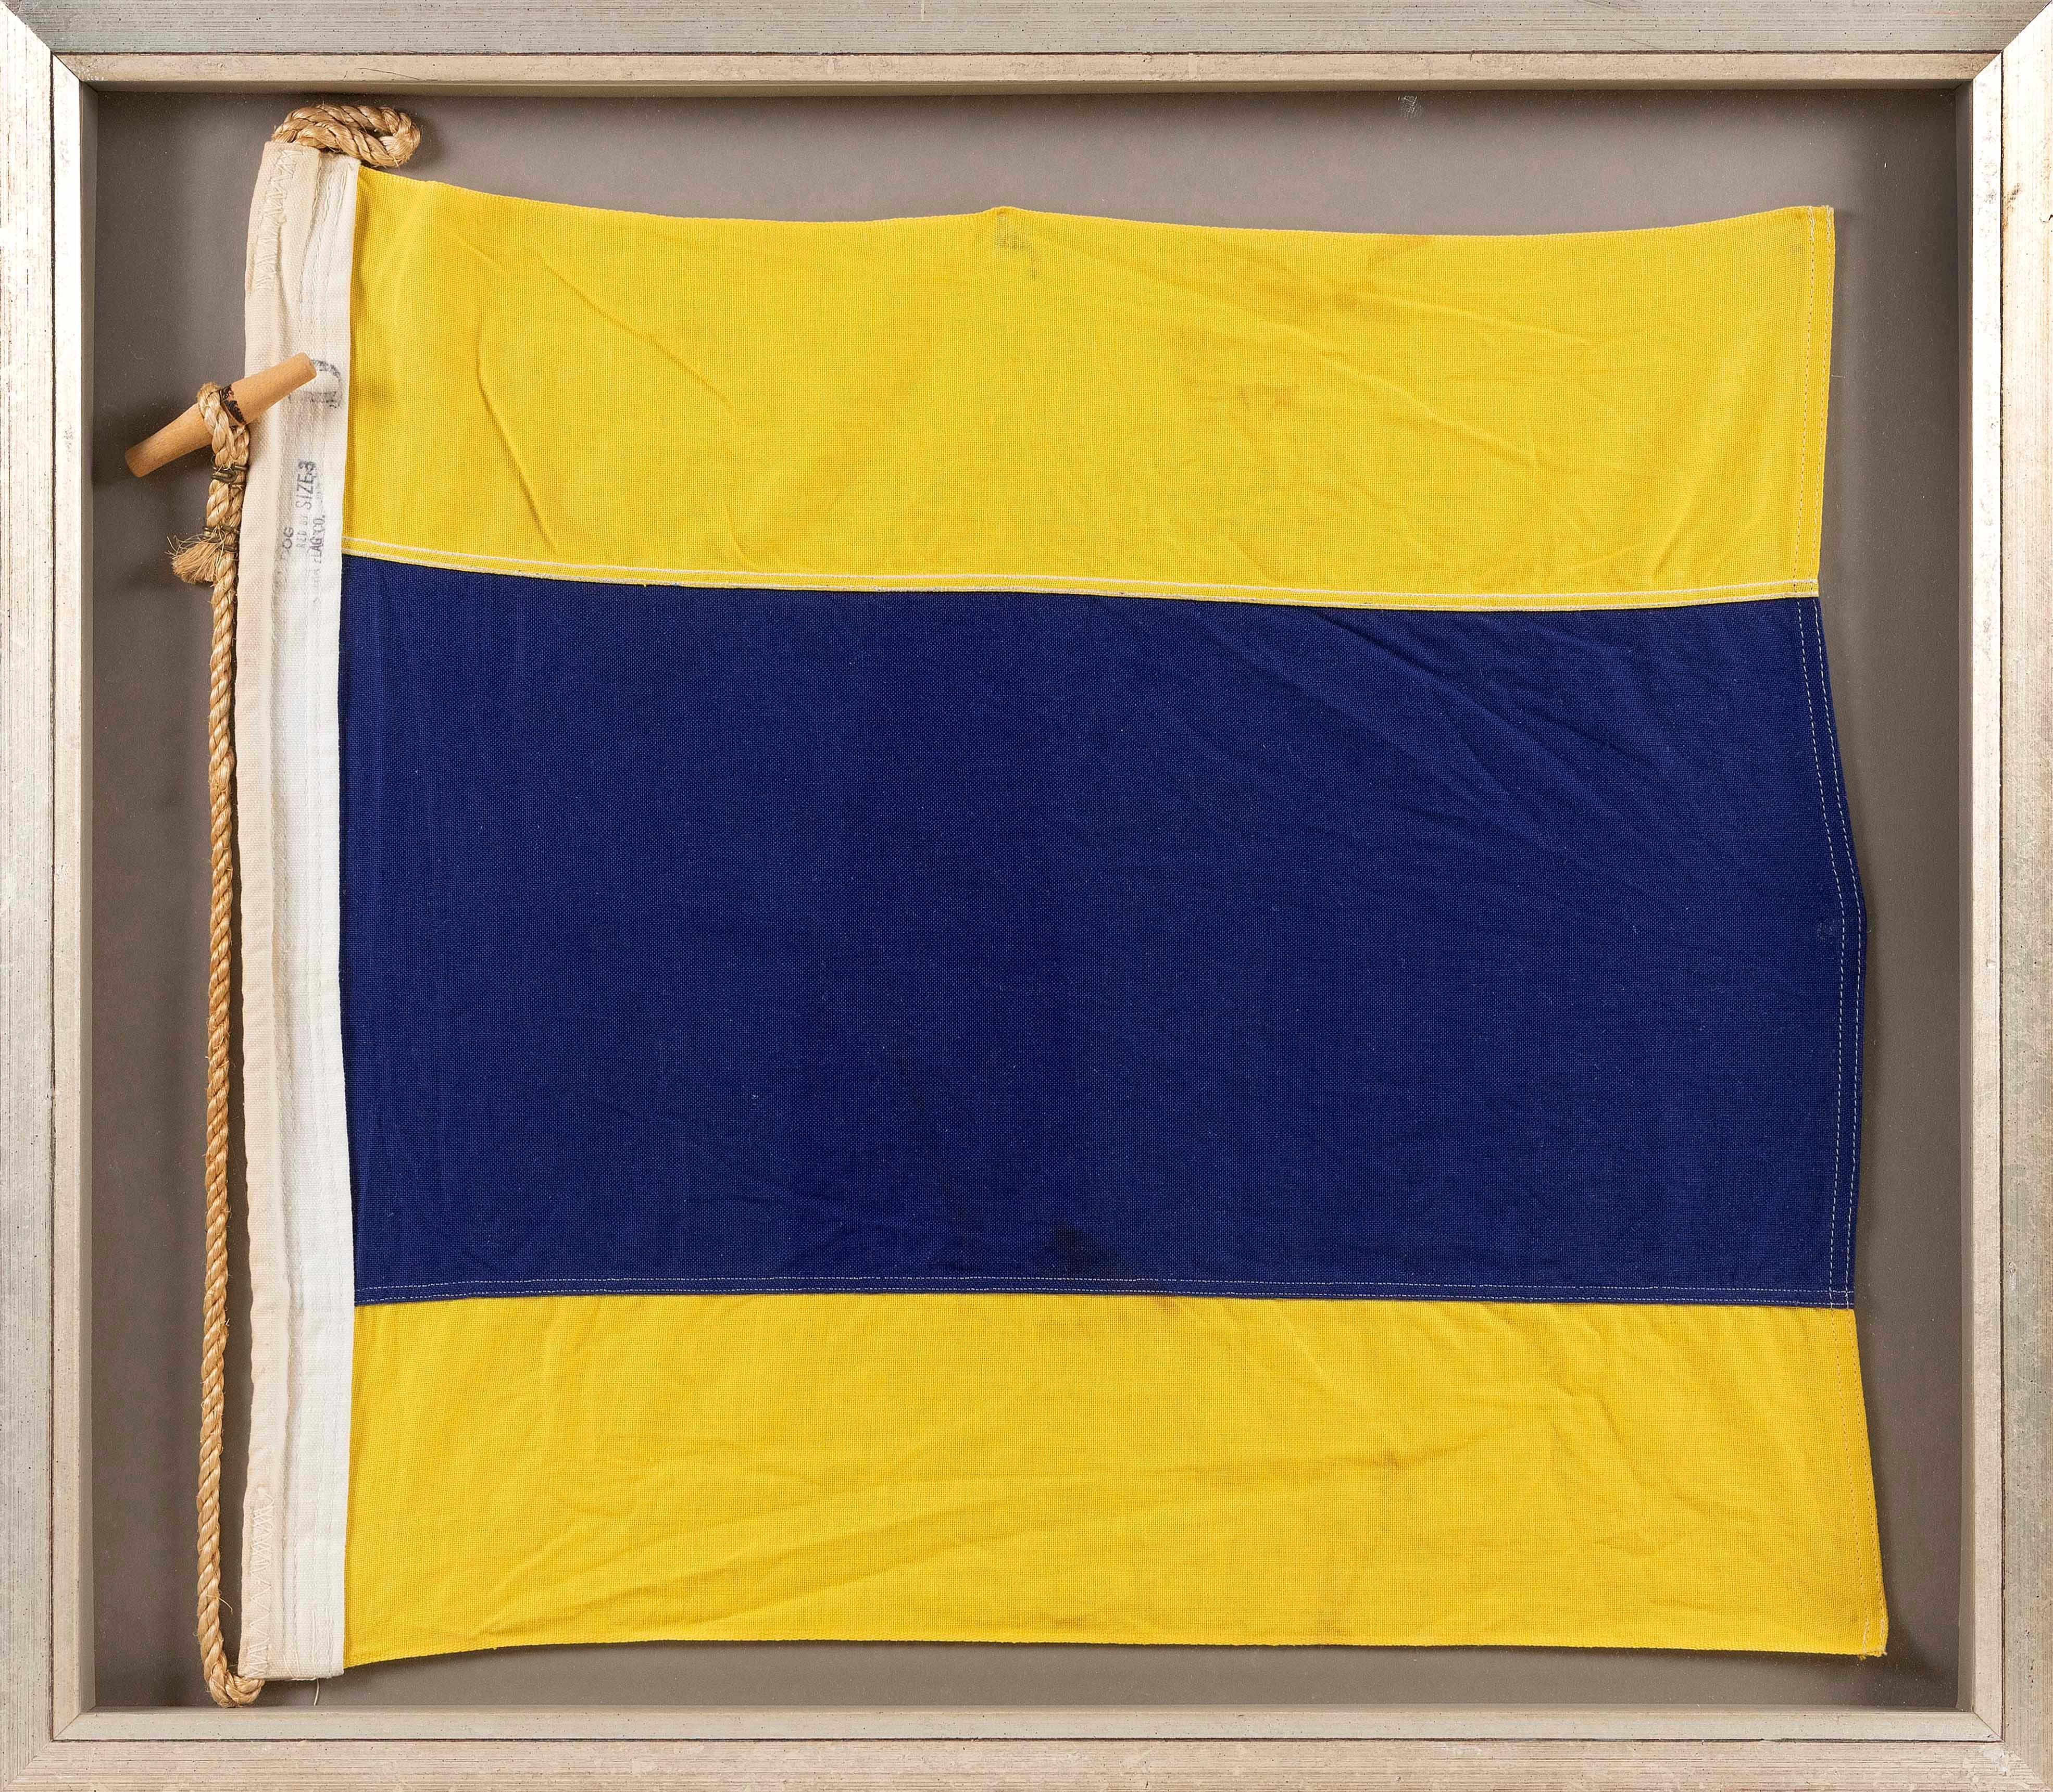 "VINTAGE NAUTICAL ""D"" OR ""DELTA"" ALPHABET SIGNAL FLAG Framed 31"" x 27""."